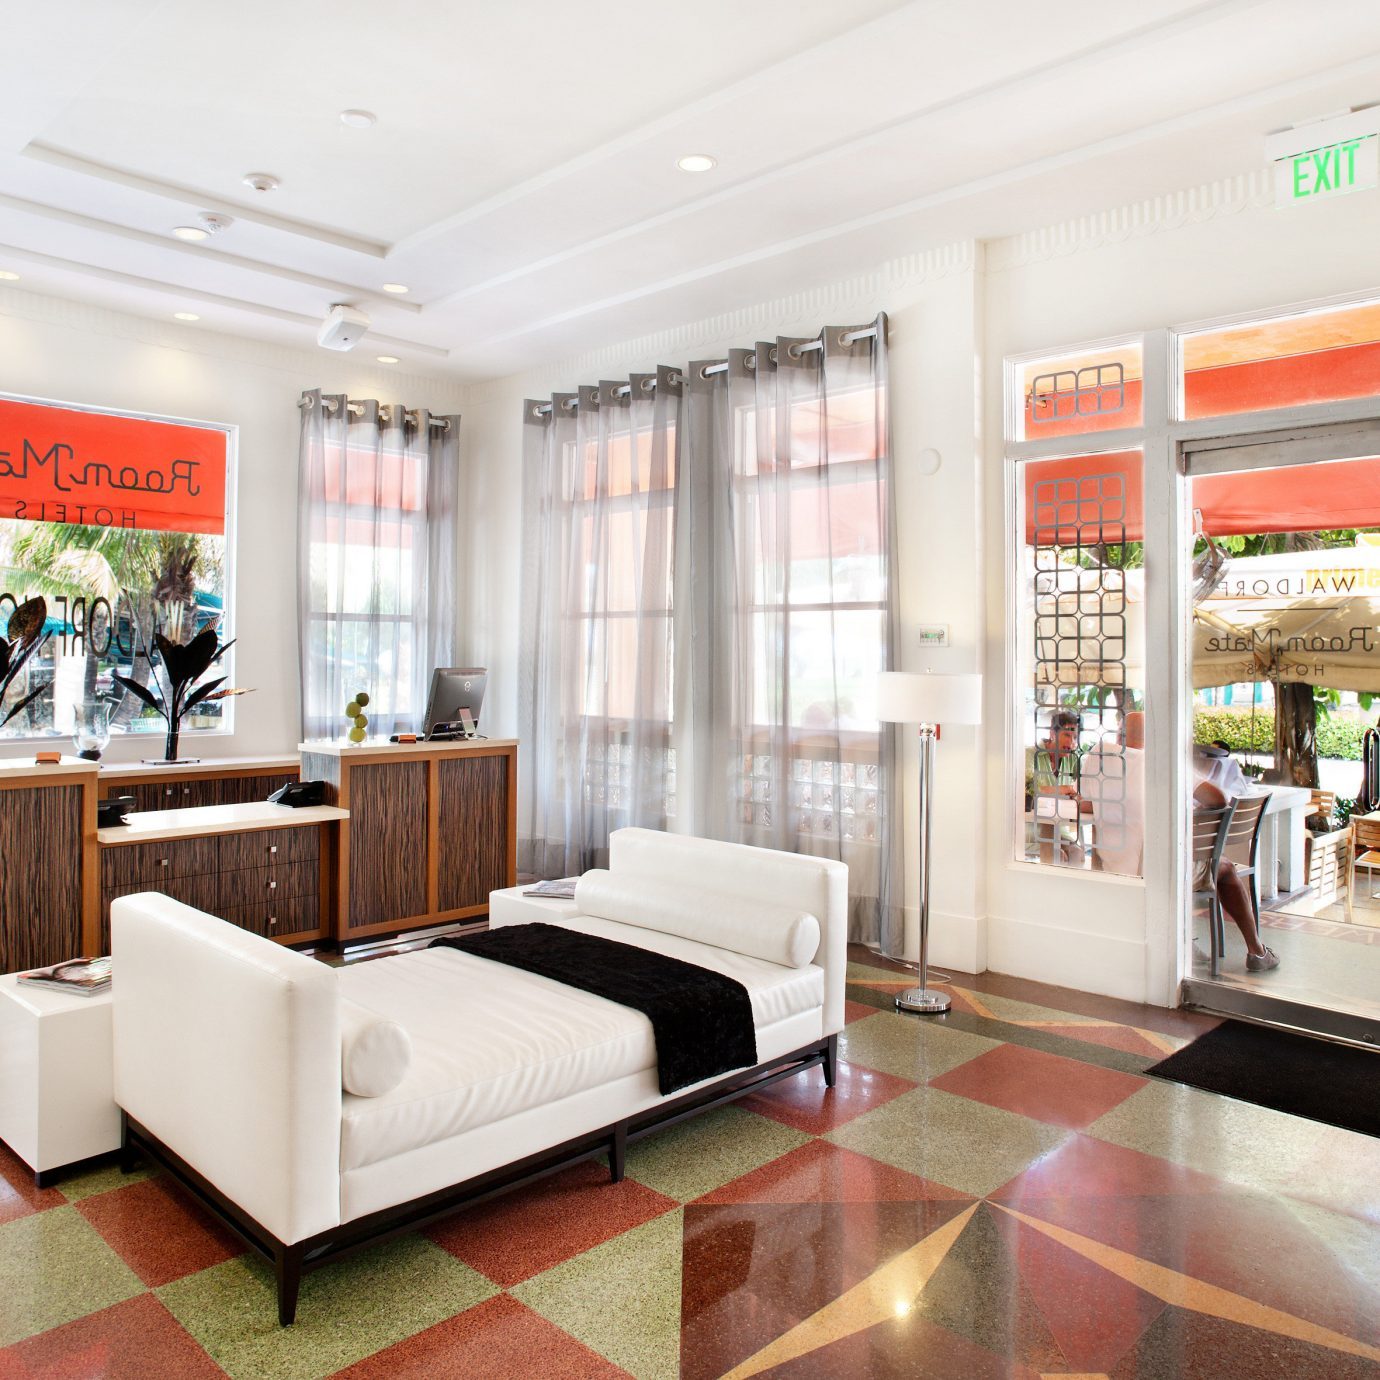 Lobby retail Boutique shopping mall waiting room condominium